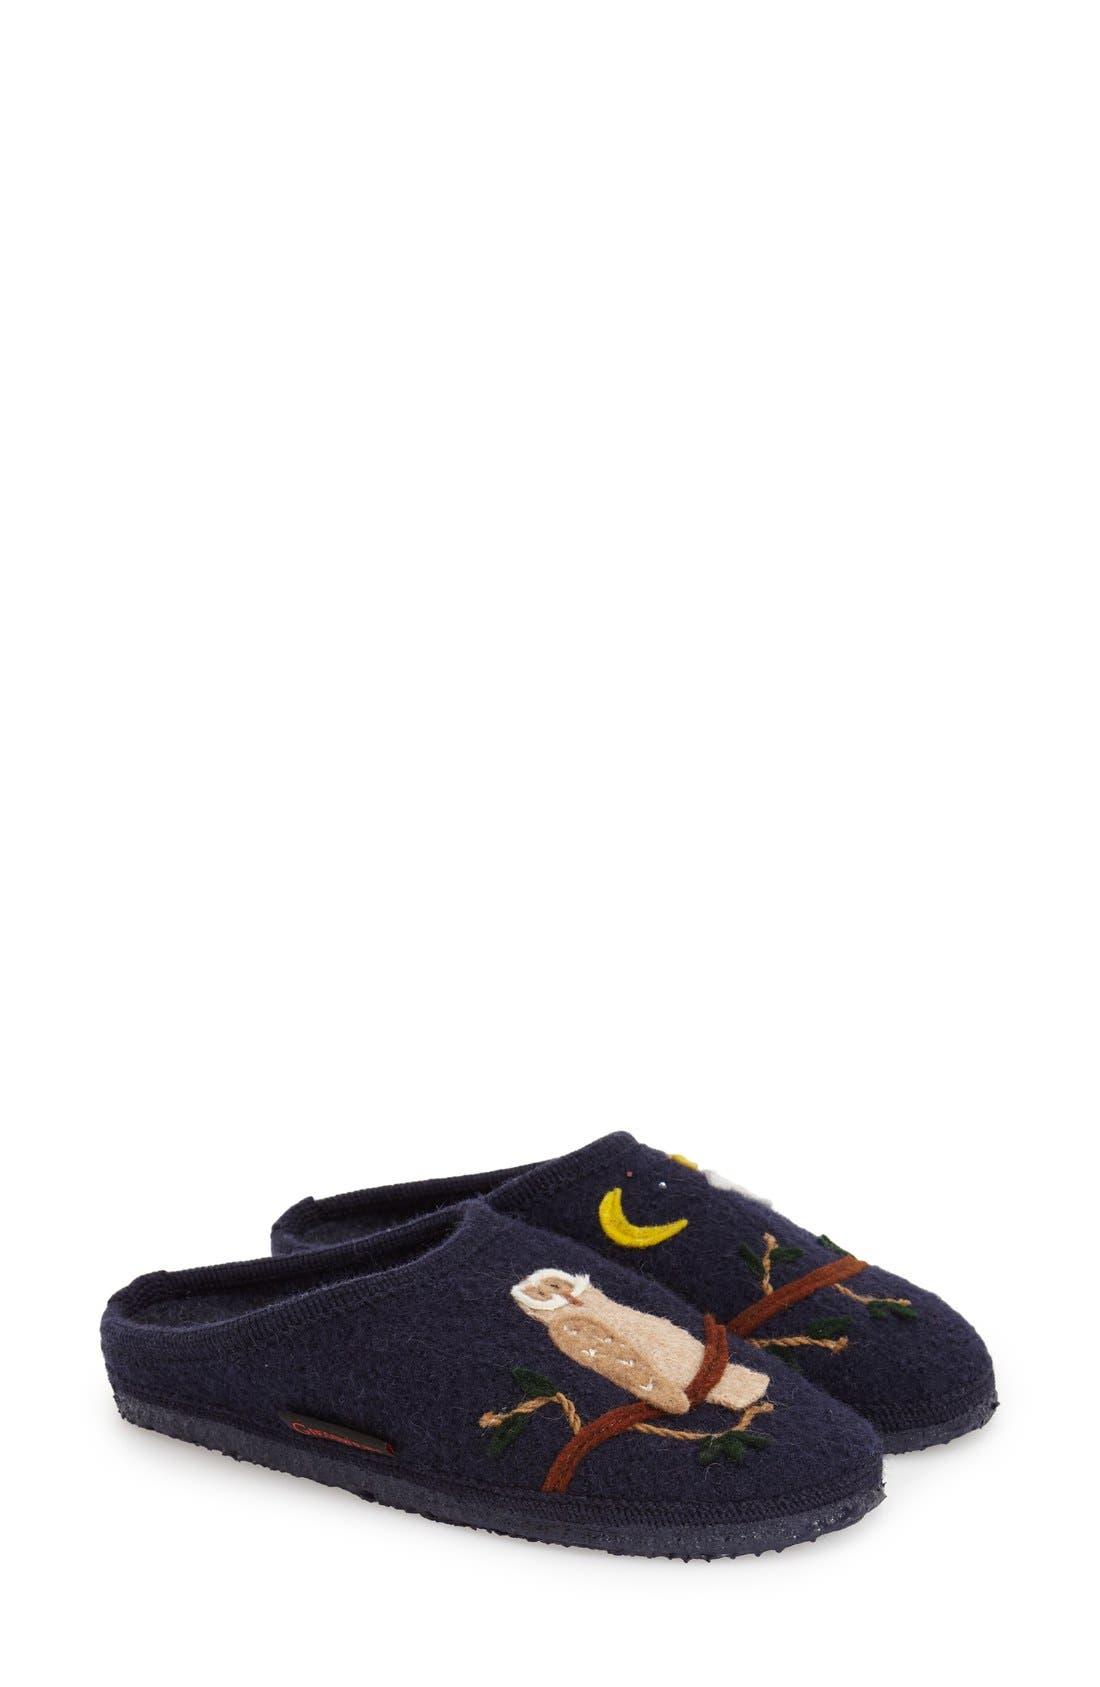 'Mado' Wool Slipper,                         Main,                         color, NAVY WOOL